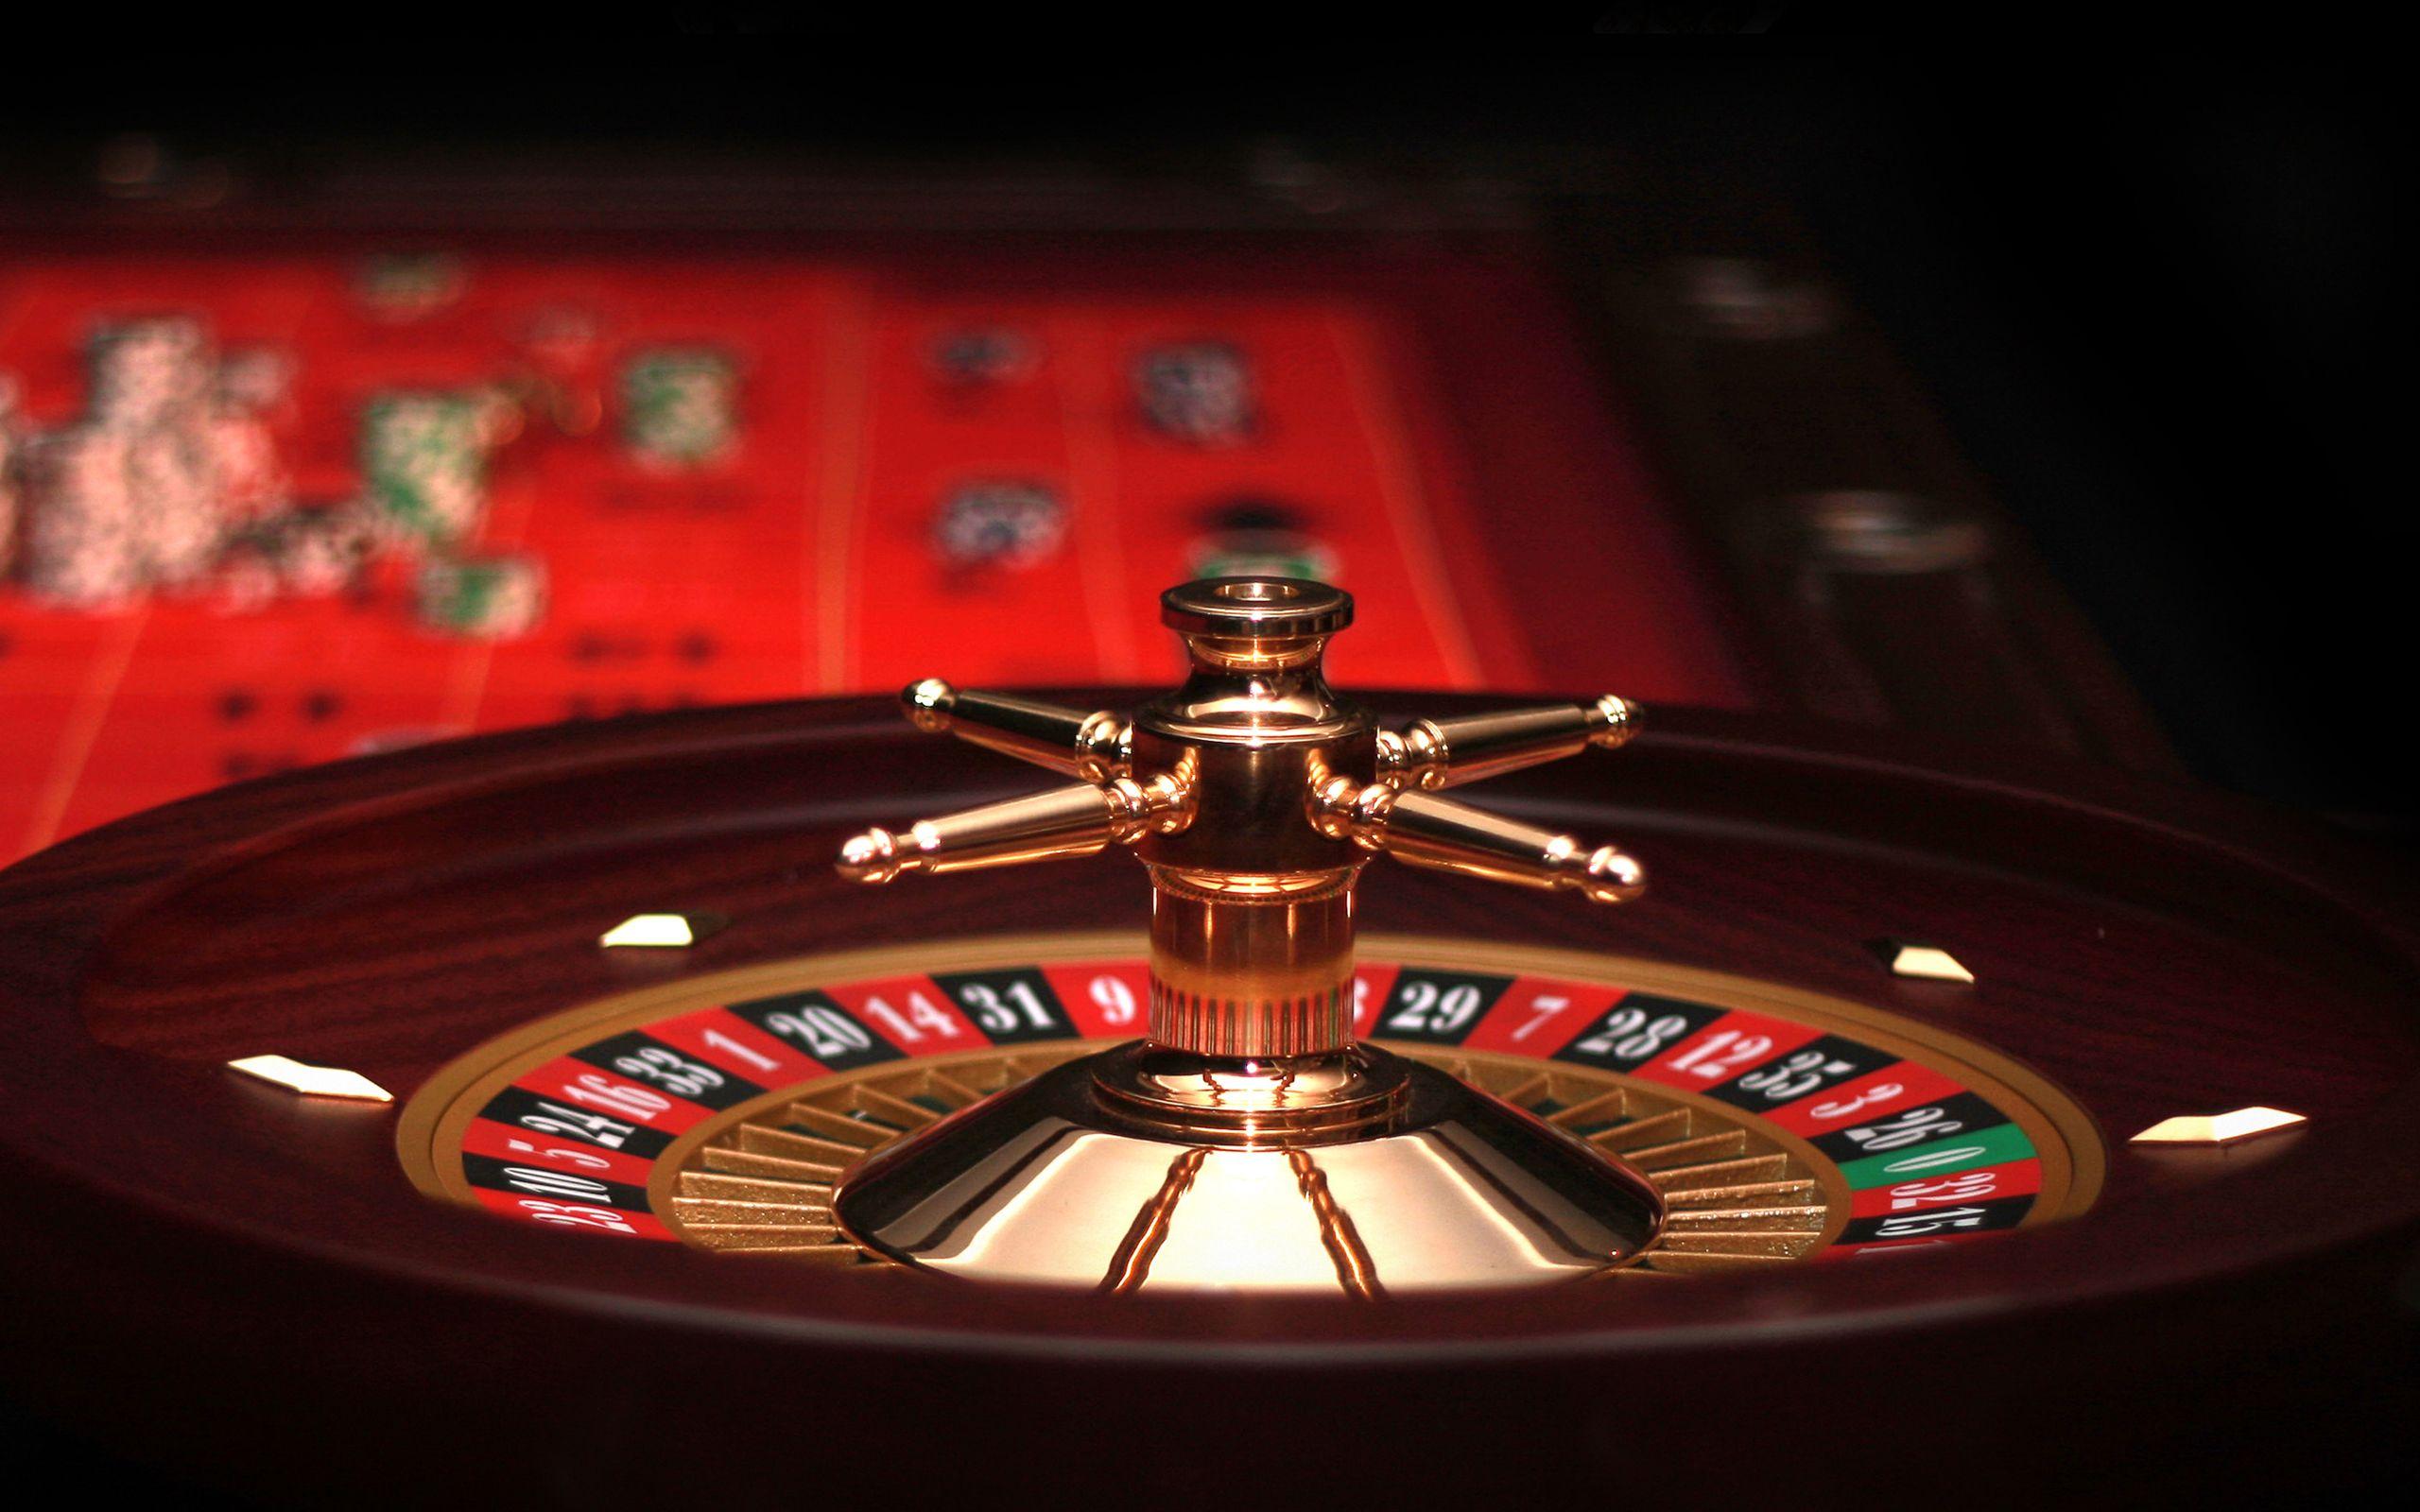 Bbs casino followup gambling internet message online post mesquite nevada hotel casinos